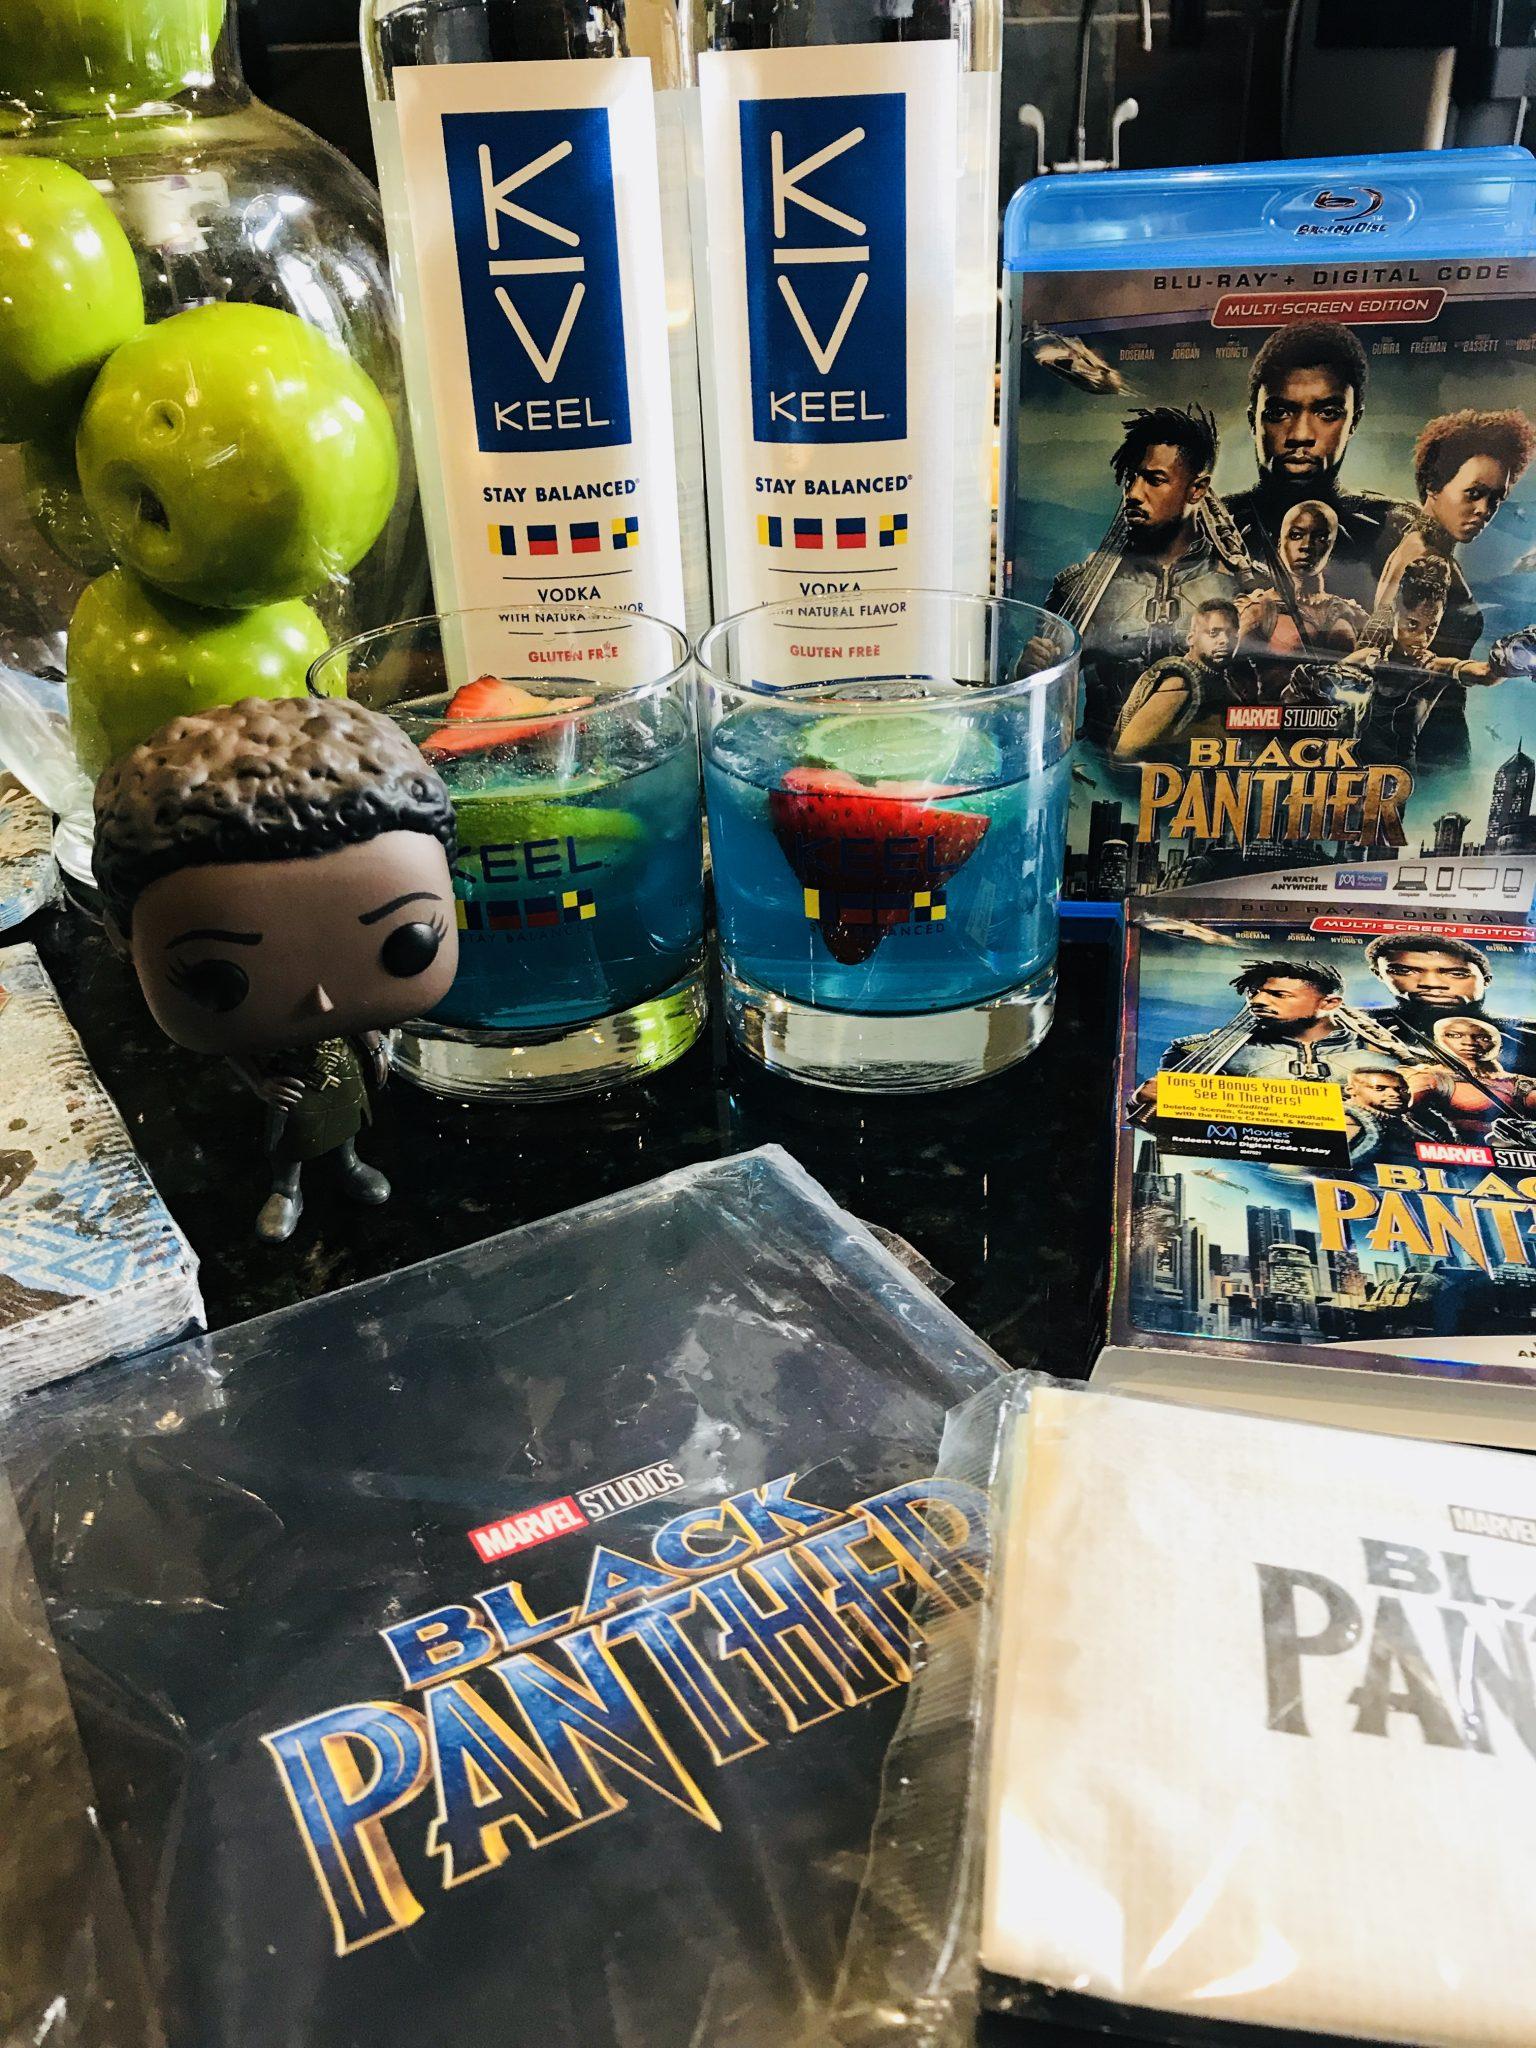 Black Panther Arrives On Blu-Ray & Movie Night Kit